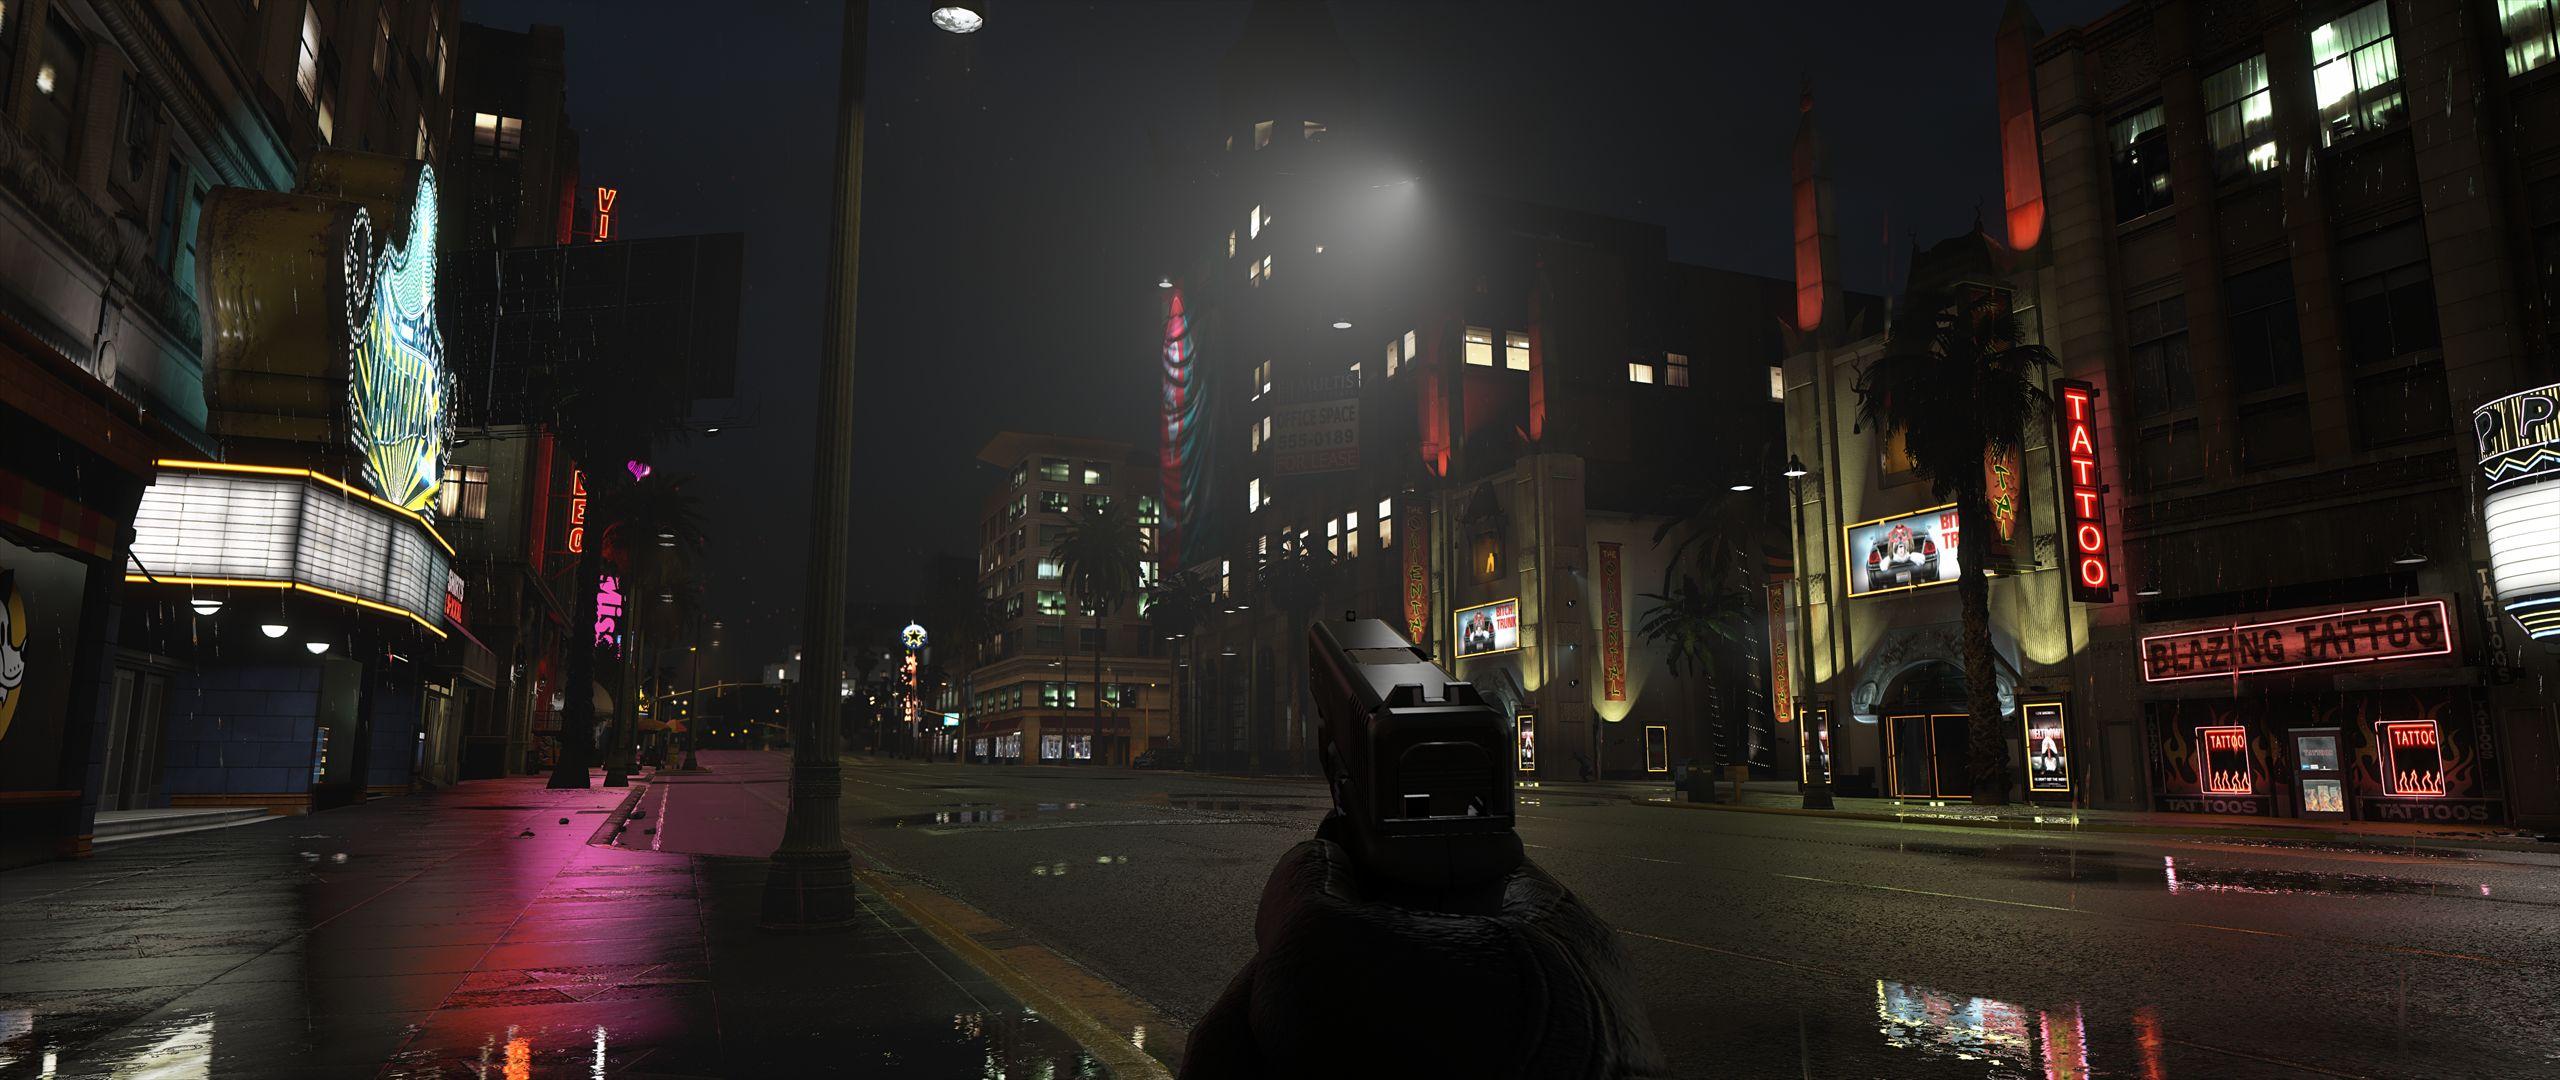 NaturalVision Remastered Mod - Grand Theft Auto 5